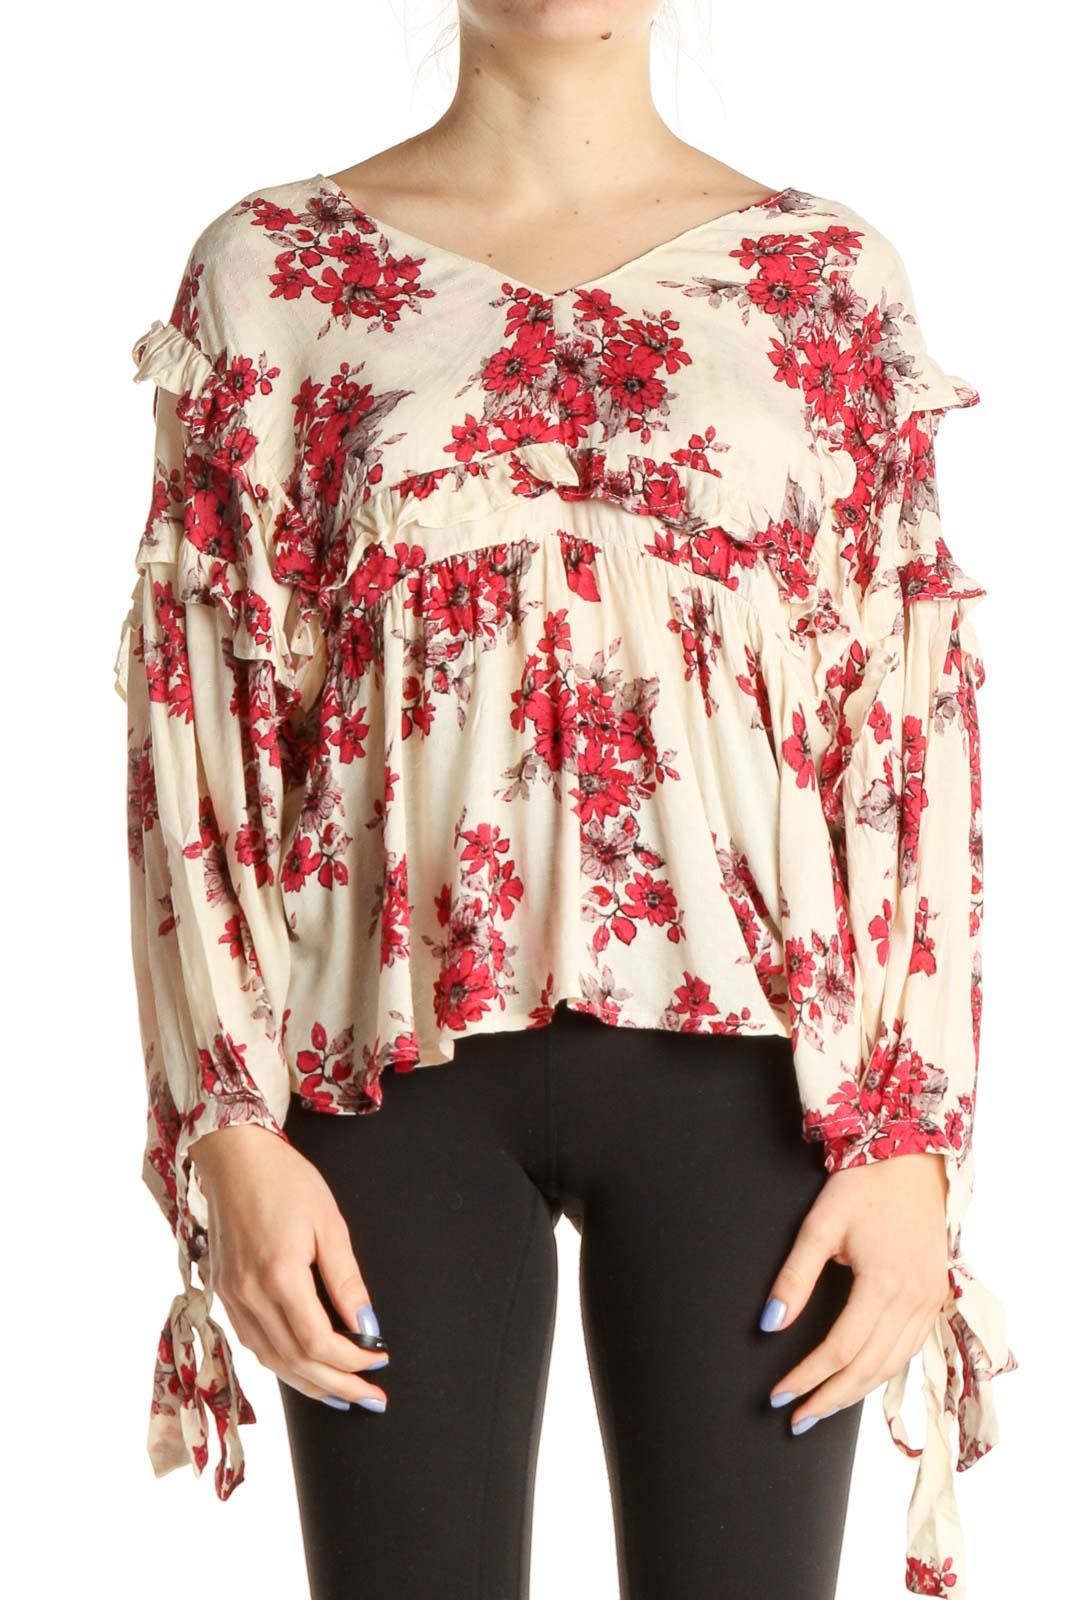 Beige Floral Print Chic Blouse Front